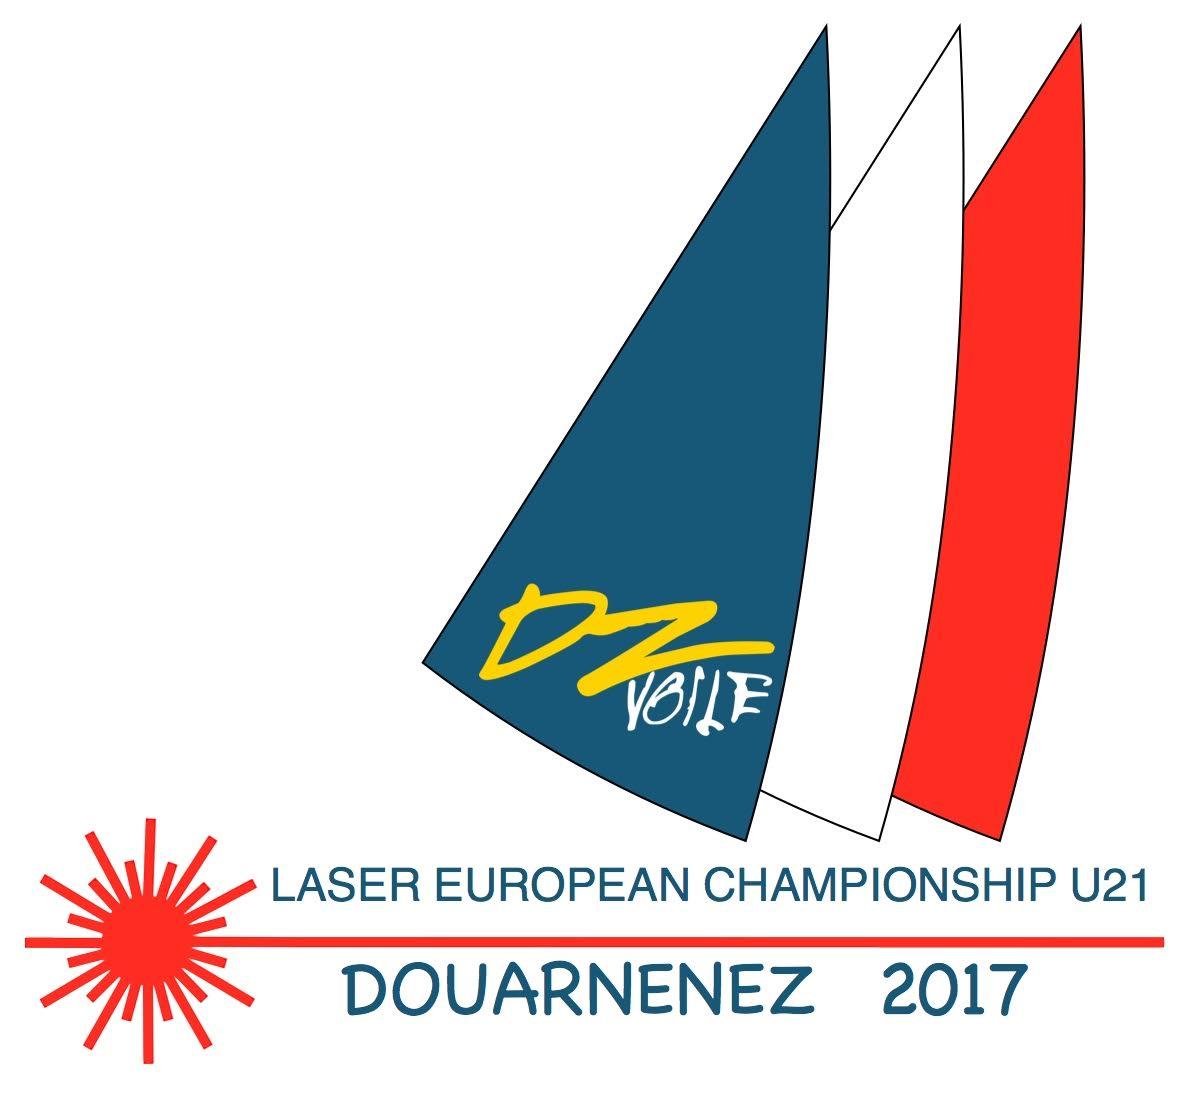 European Laser Under 21 Championships & Trophy 2017